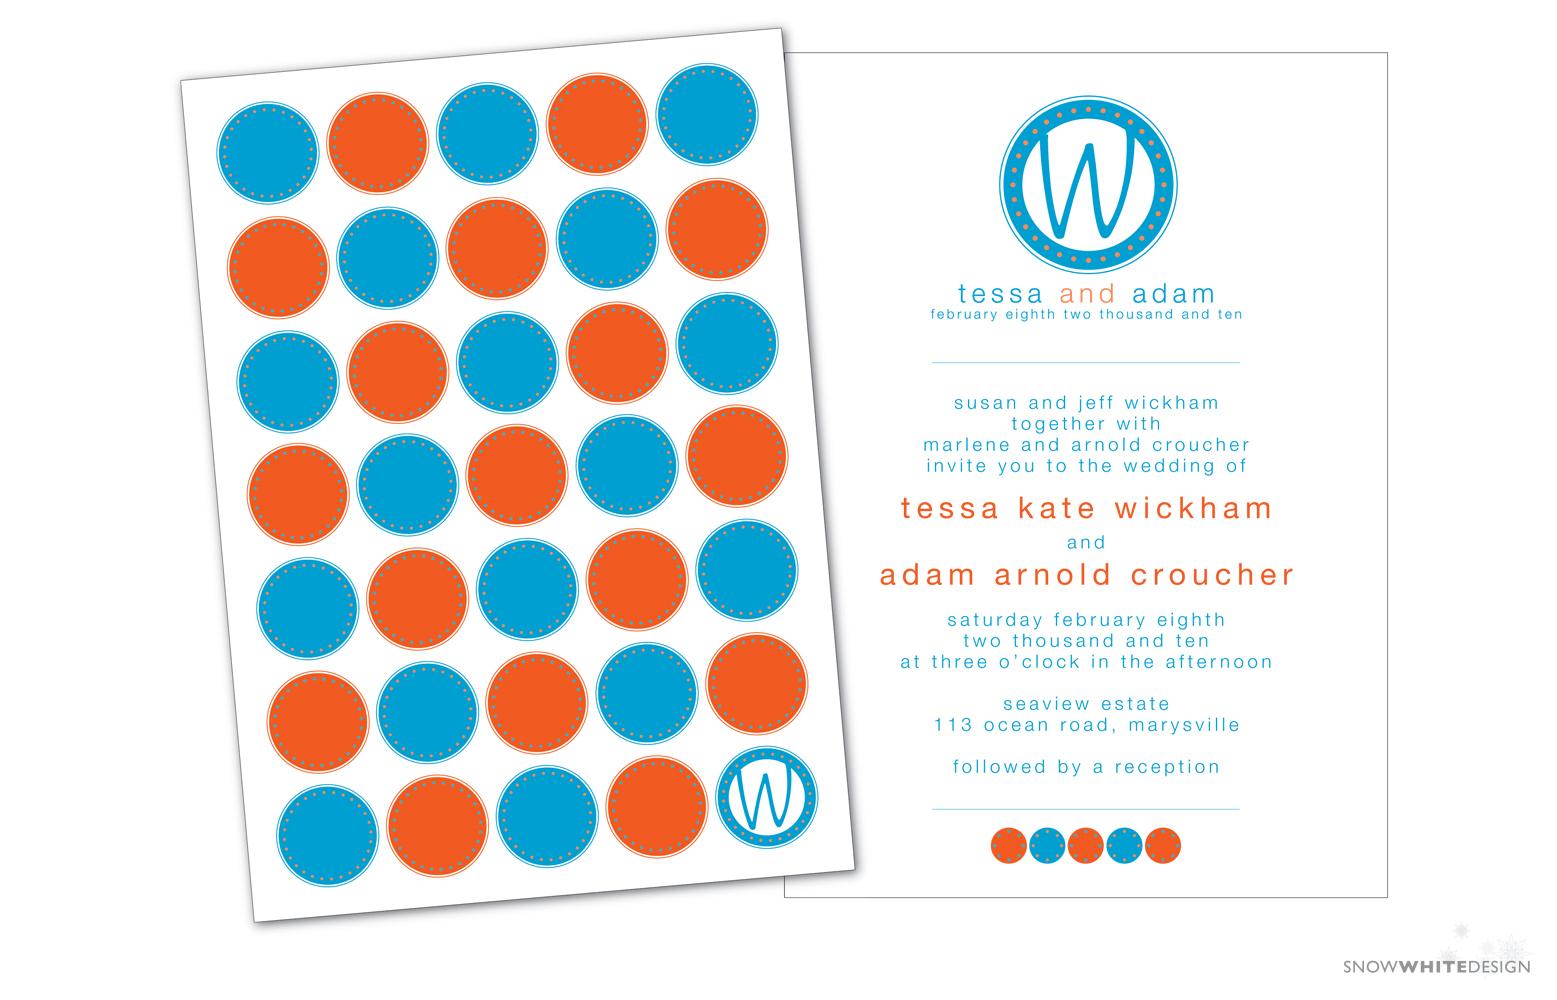 DIY, Stationery, white, orange, blue, invitation, Invitations, Monogram, Pumpkin, Teal, Design, Invite, Snow, Circle, Snow white design